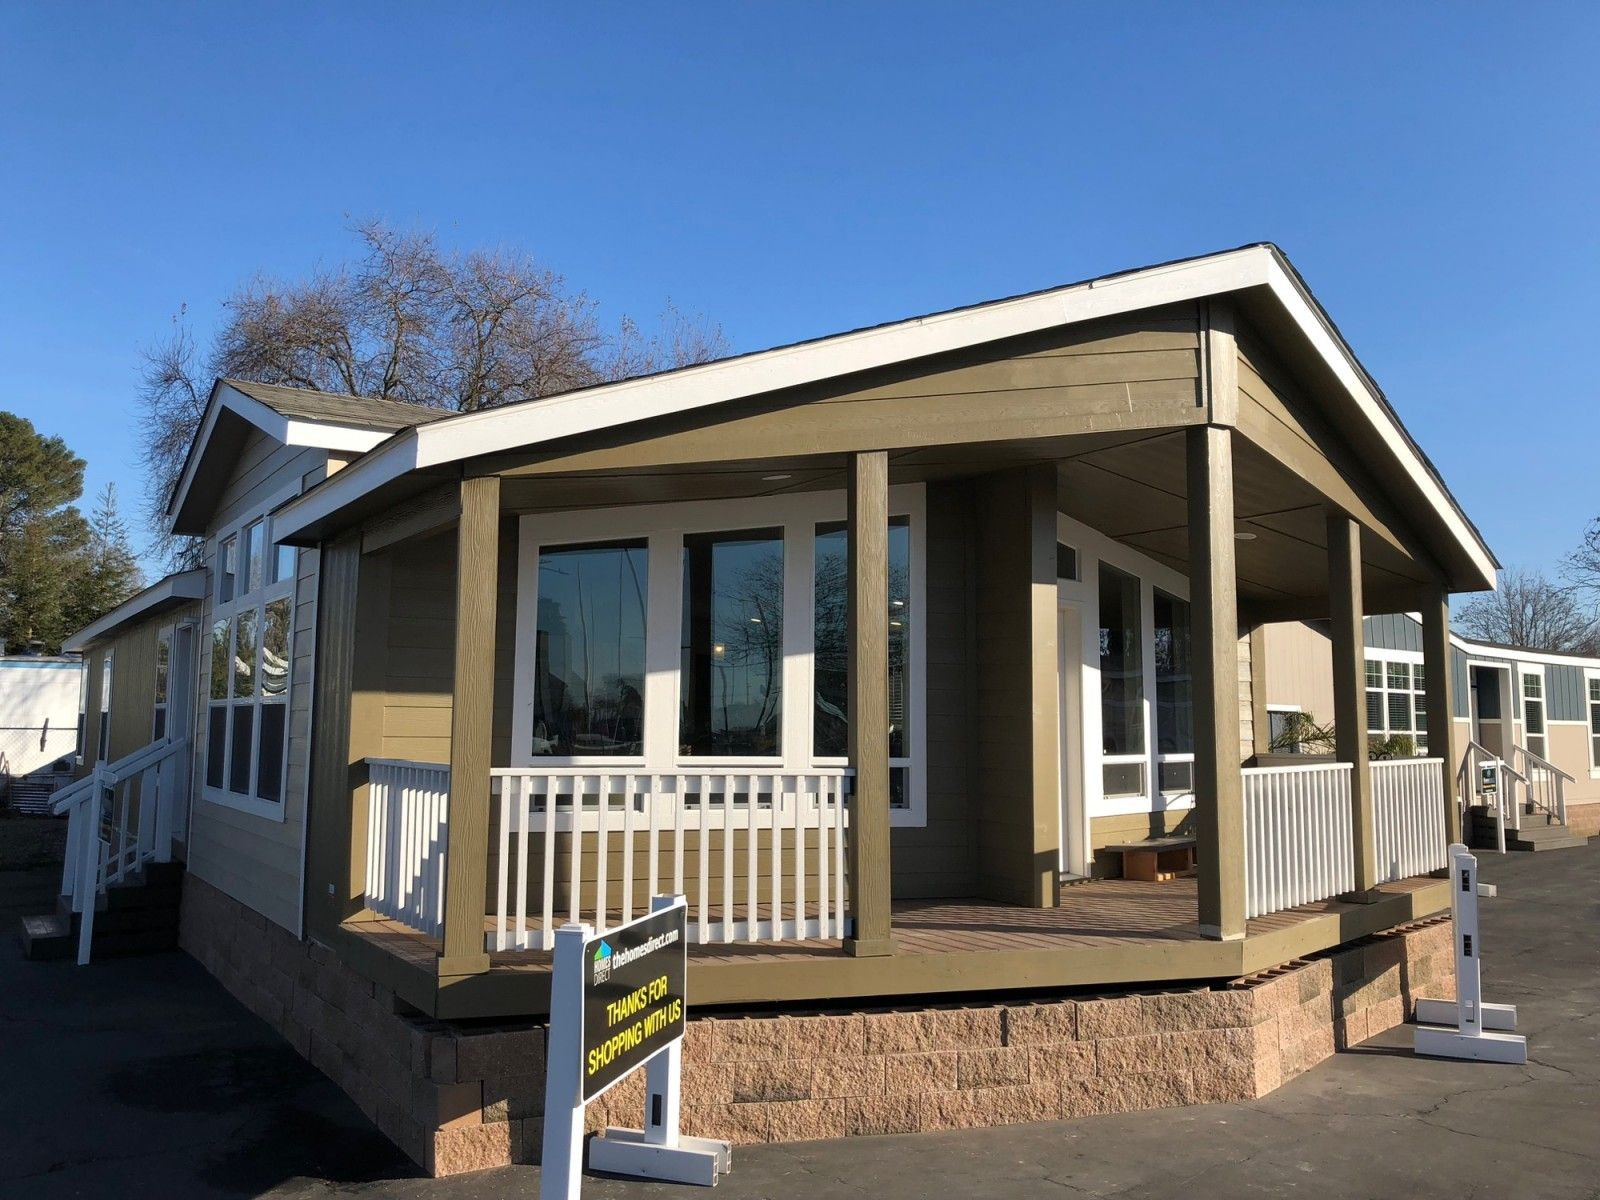 Metolius Cabin 2 Modular home builders, Manufactured